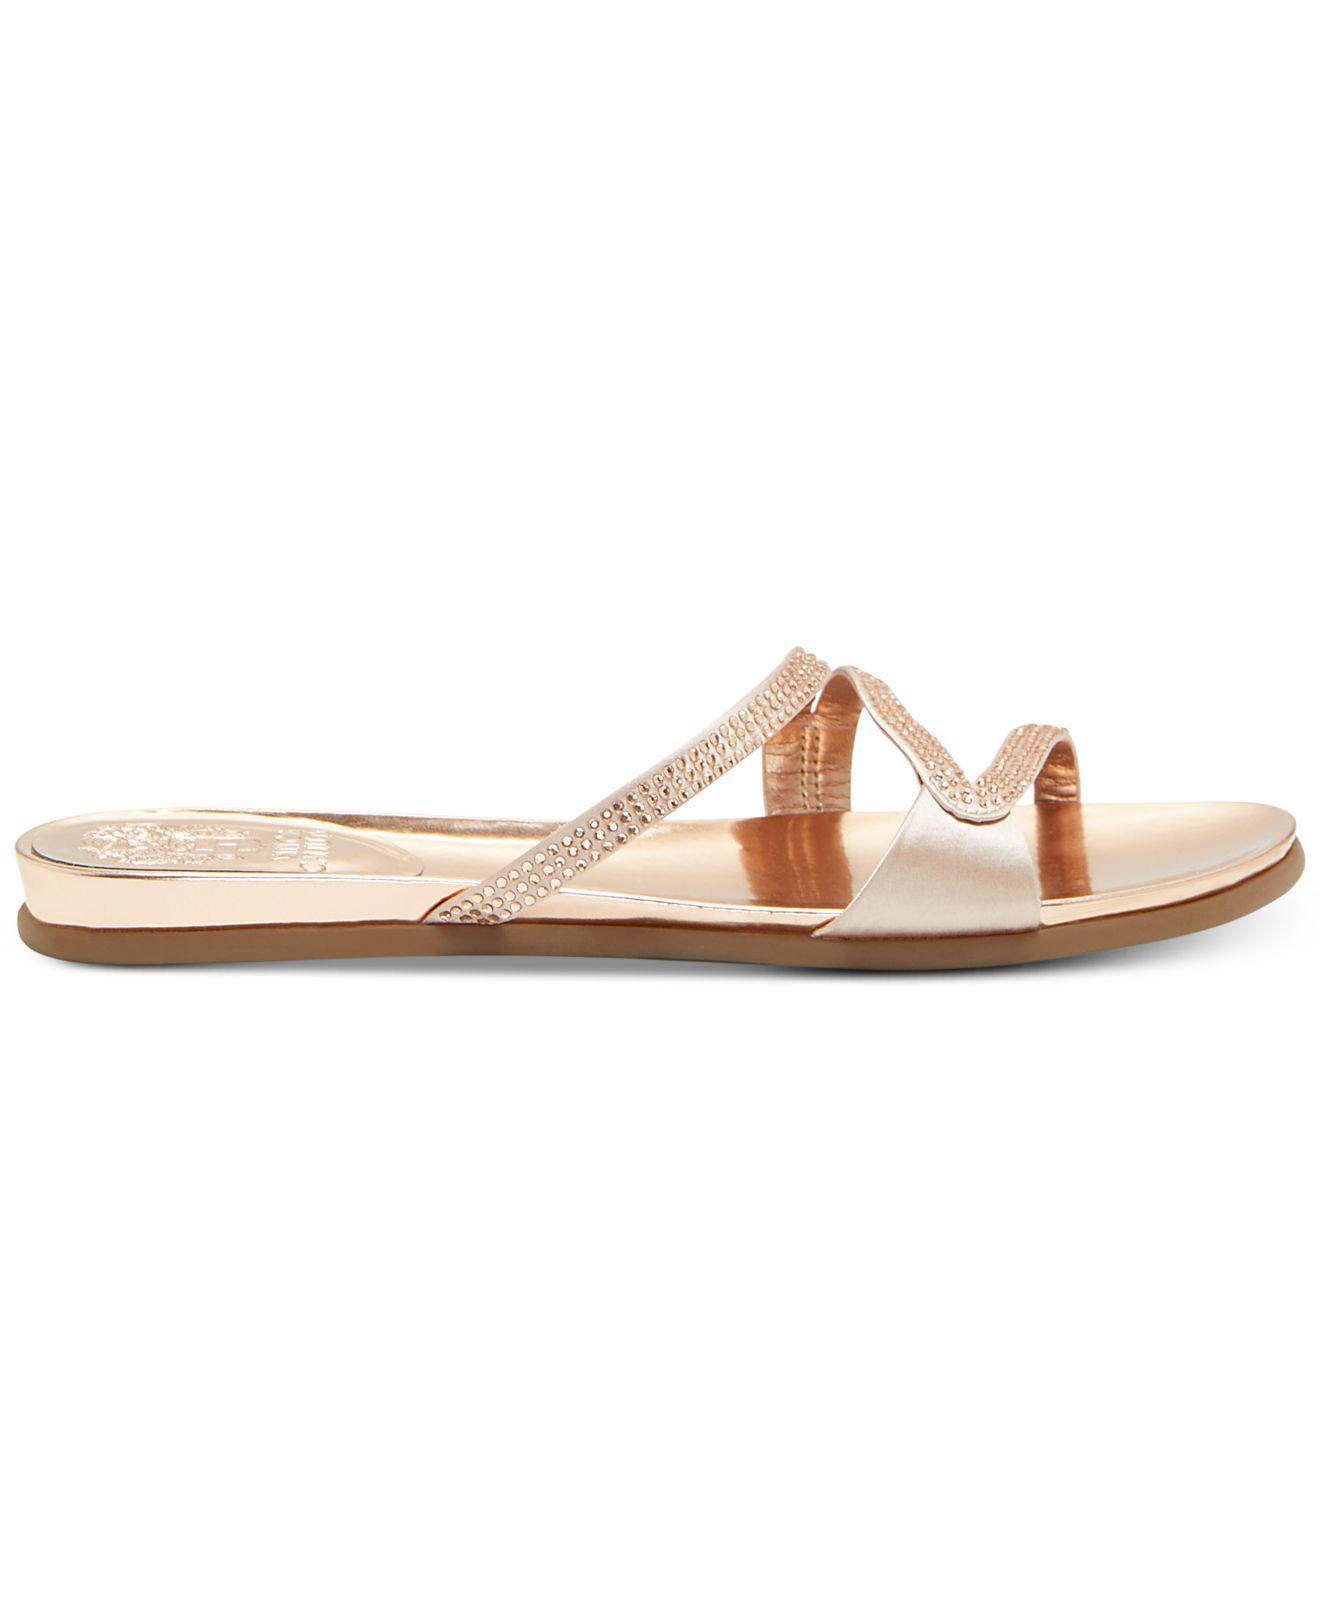 3387c746522 Lyst - Vince Camuto Elouisa Slide Sandals